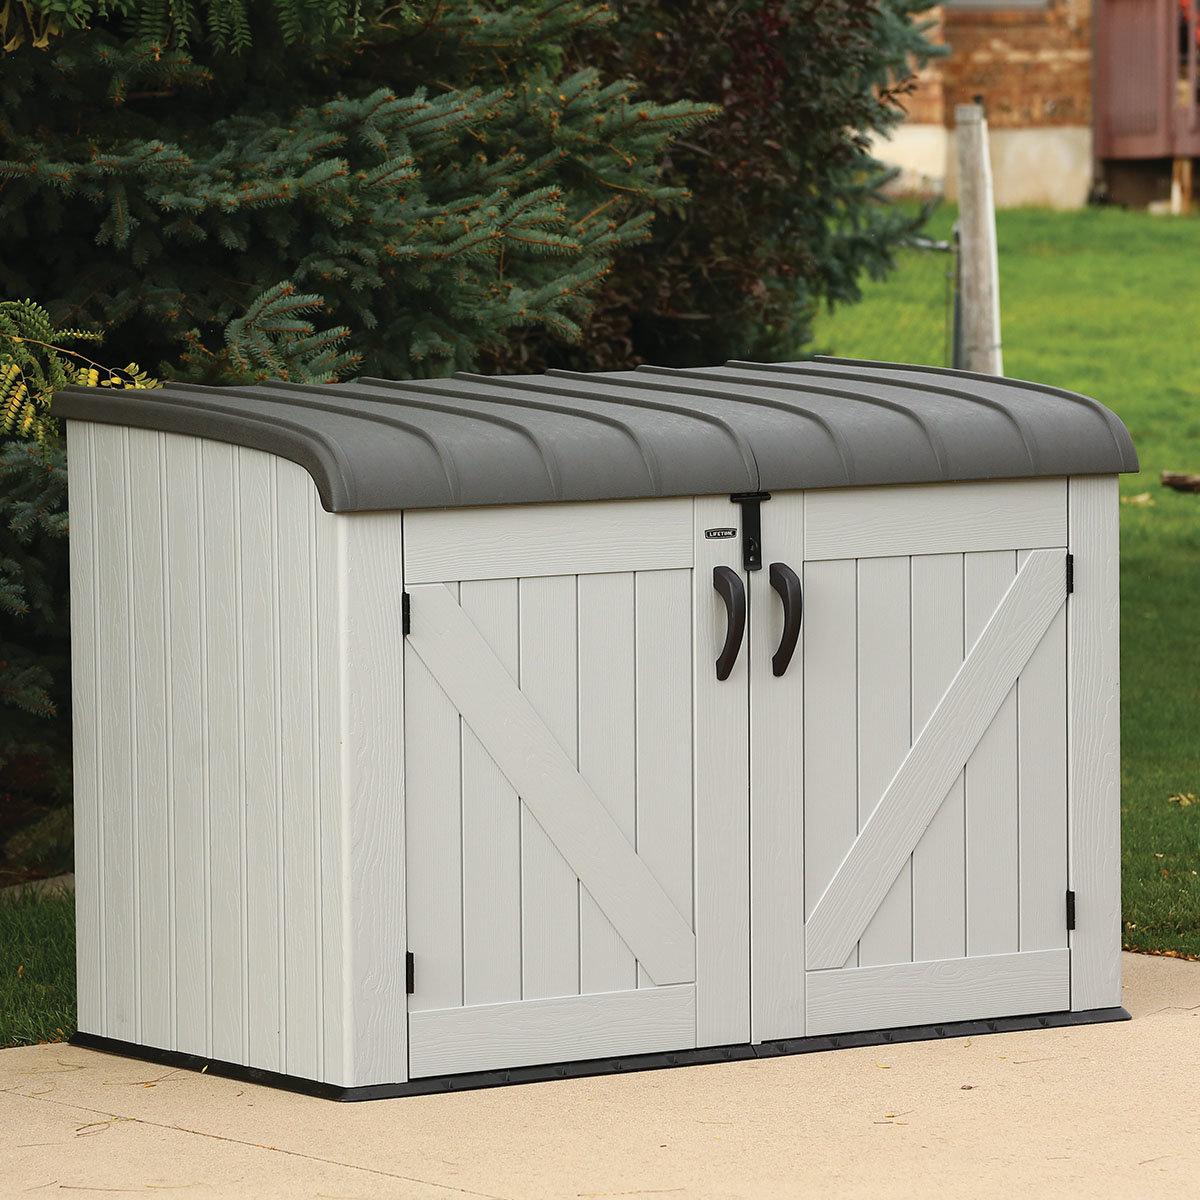 Gerätebox-Mülltonnenbox, 132x191x108 cm, grau | #8